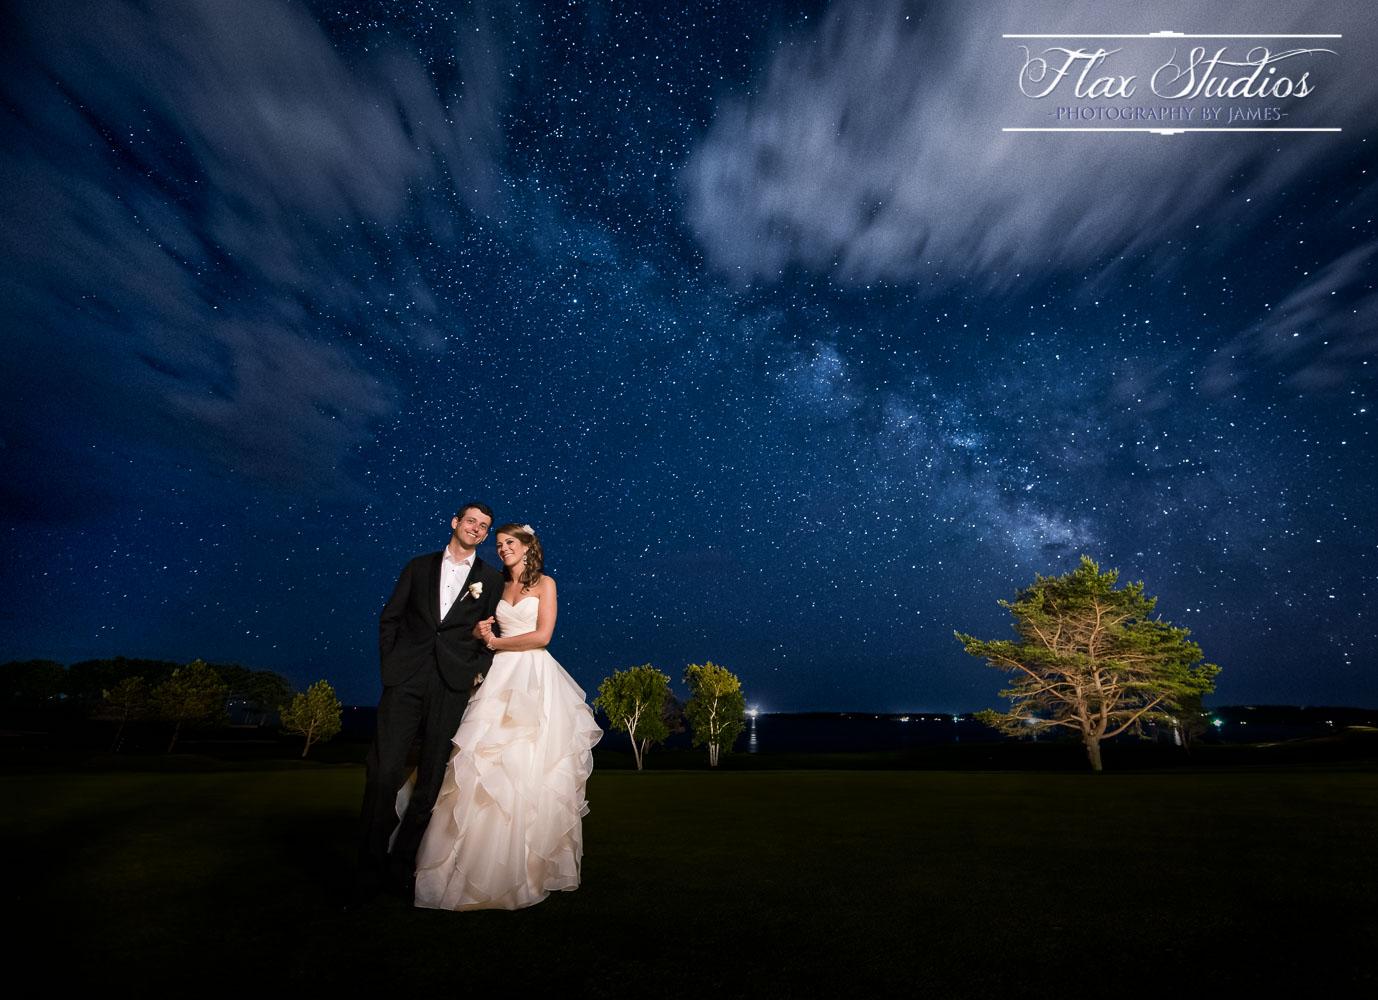 Flax Studios Samoset Wedding Photographer Rockland Maine